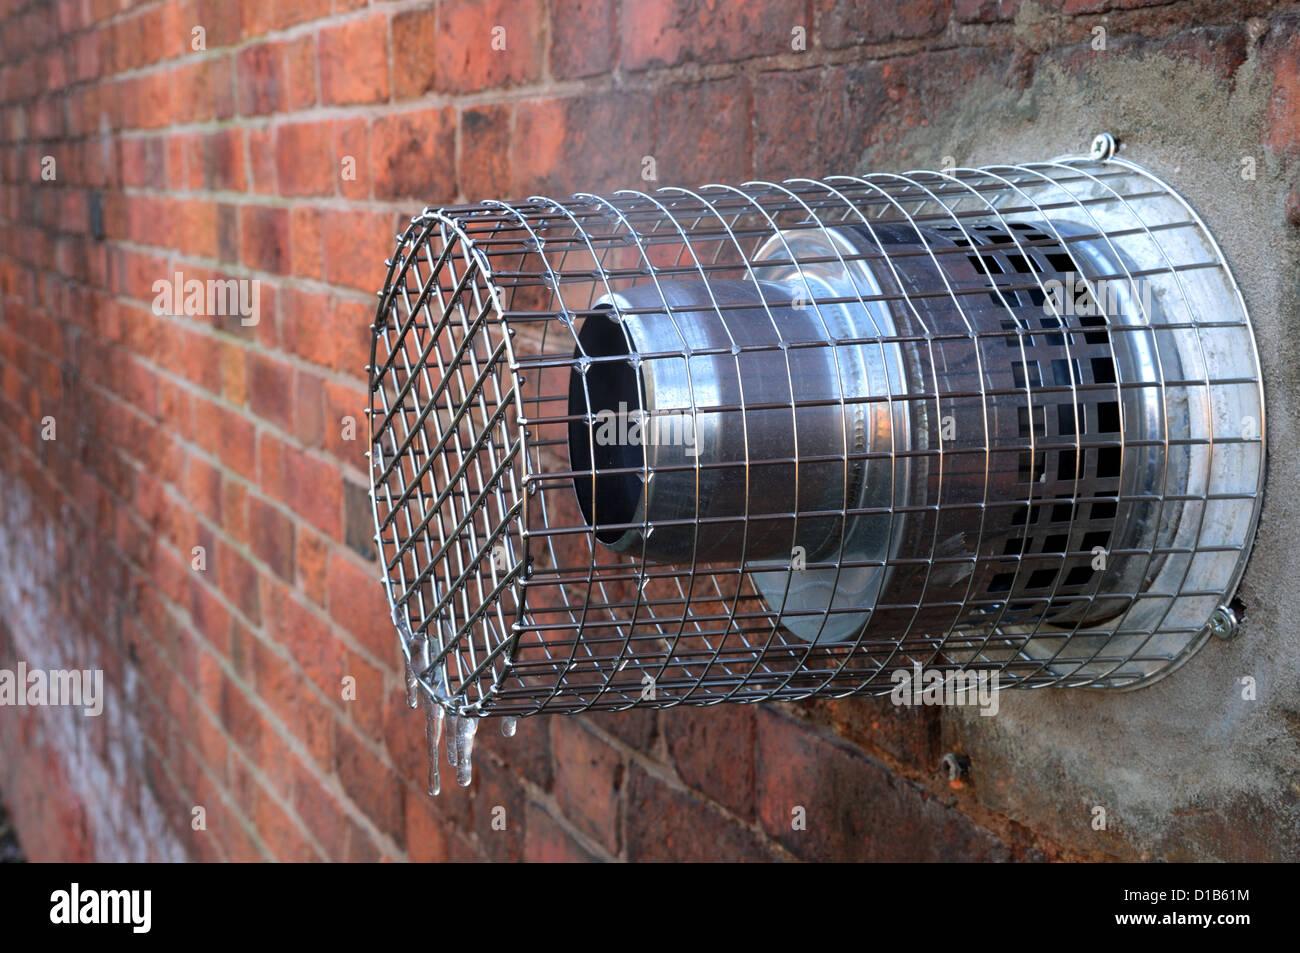 Condensing Boiler Exhaust Vent. - Stock Image